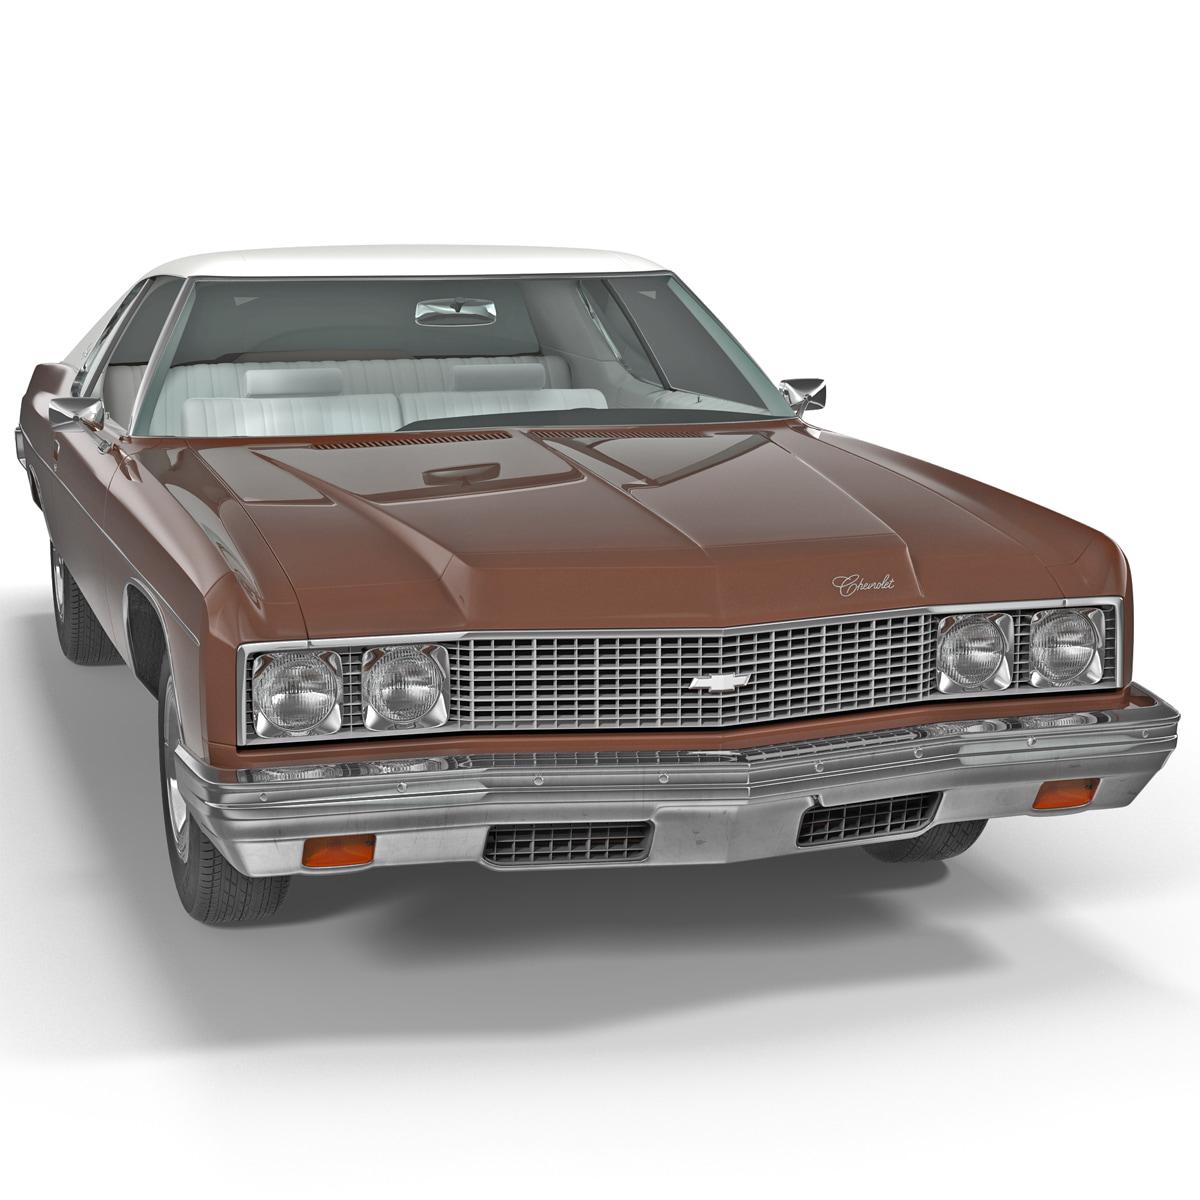 3d model chevrolet impala